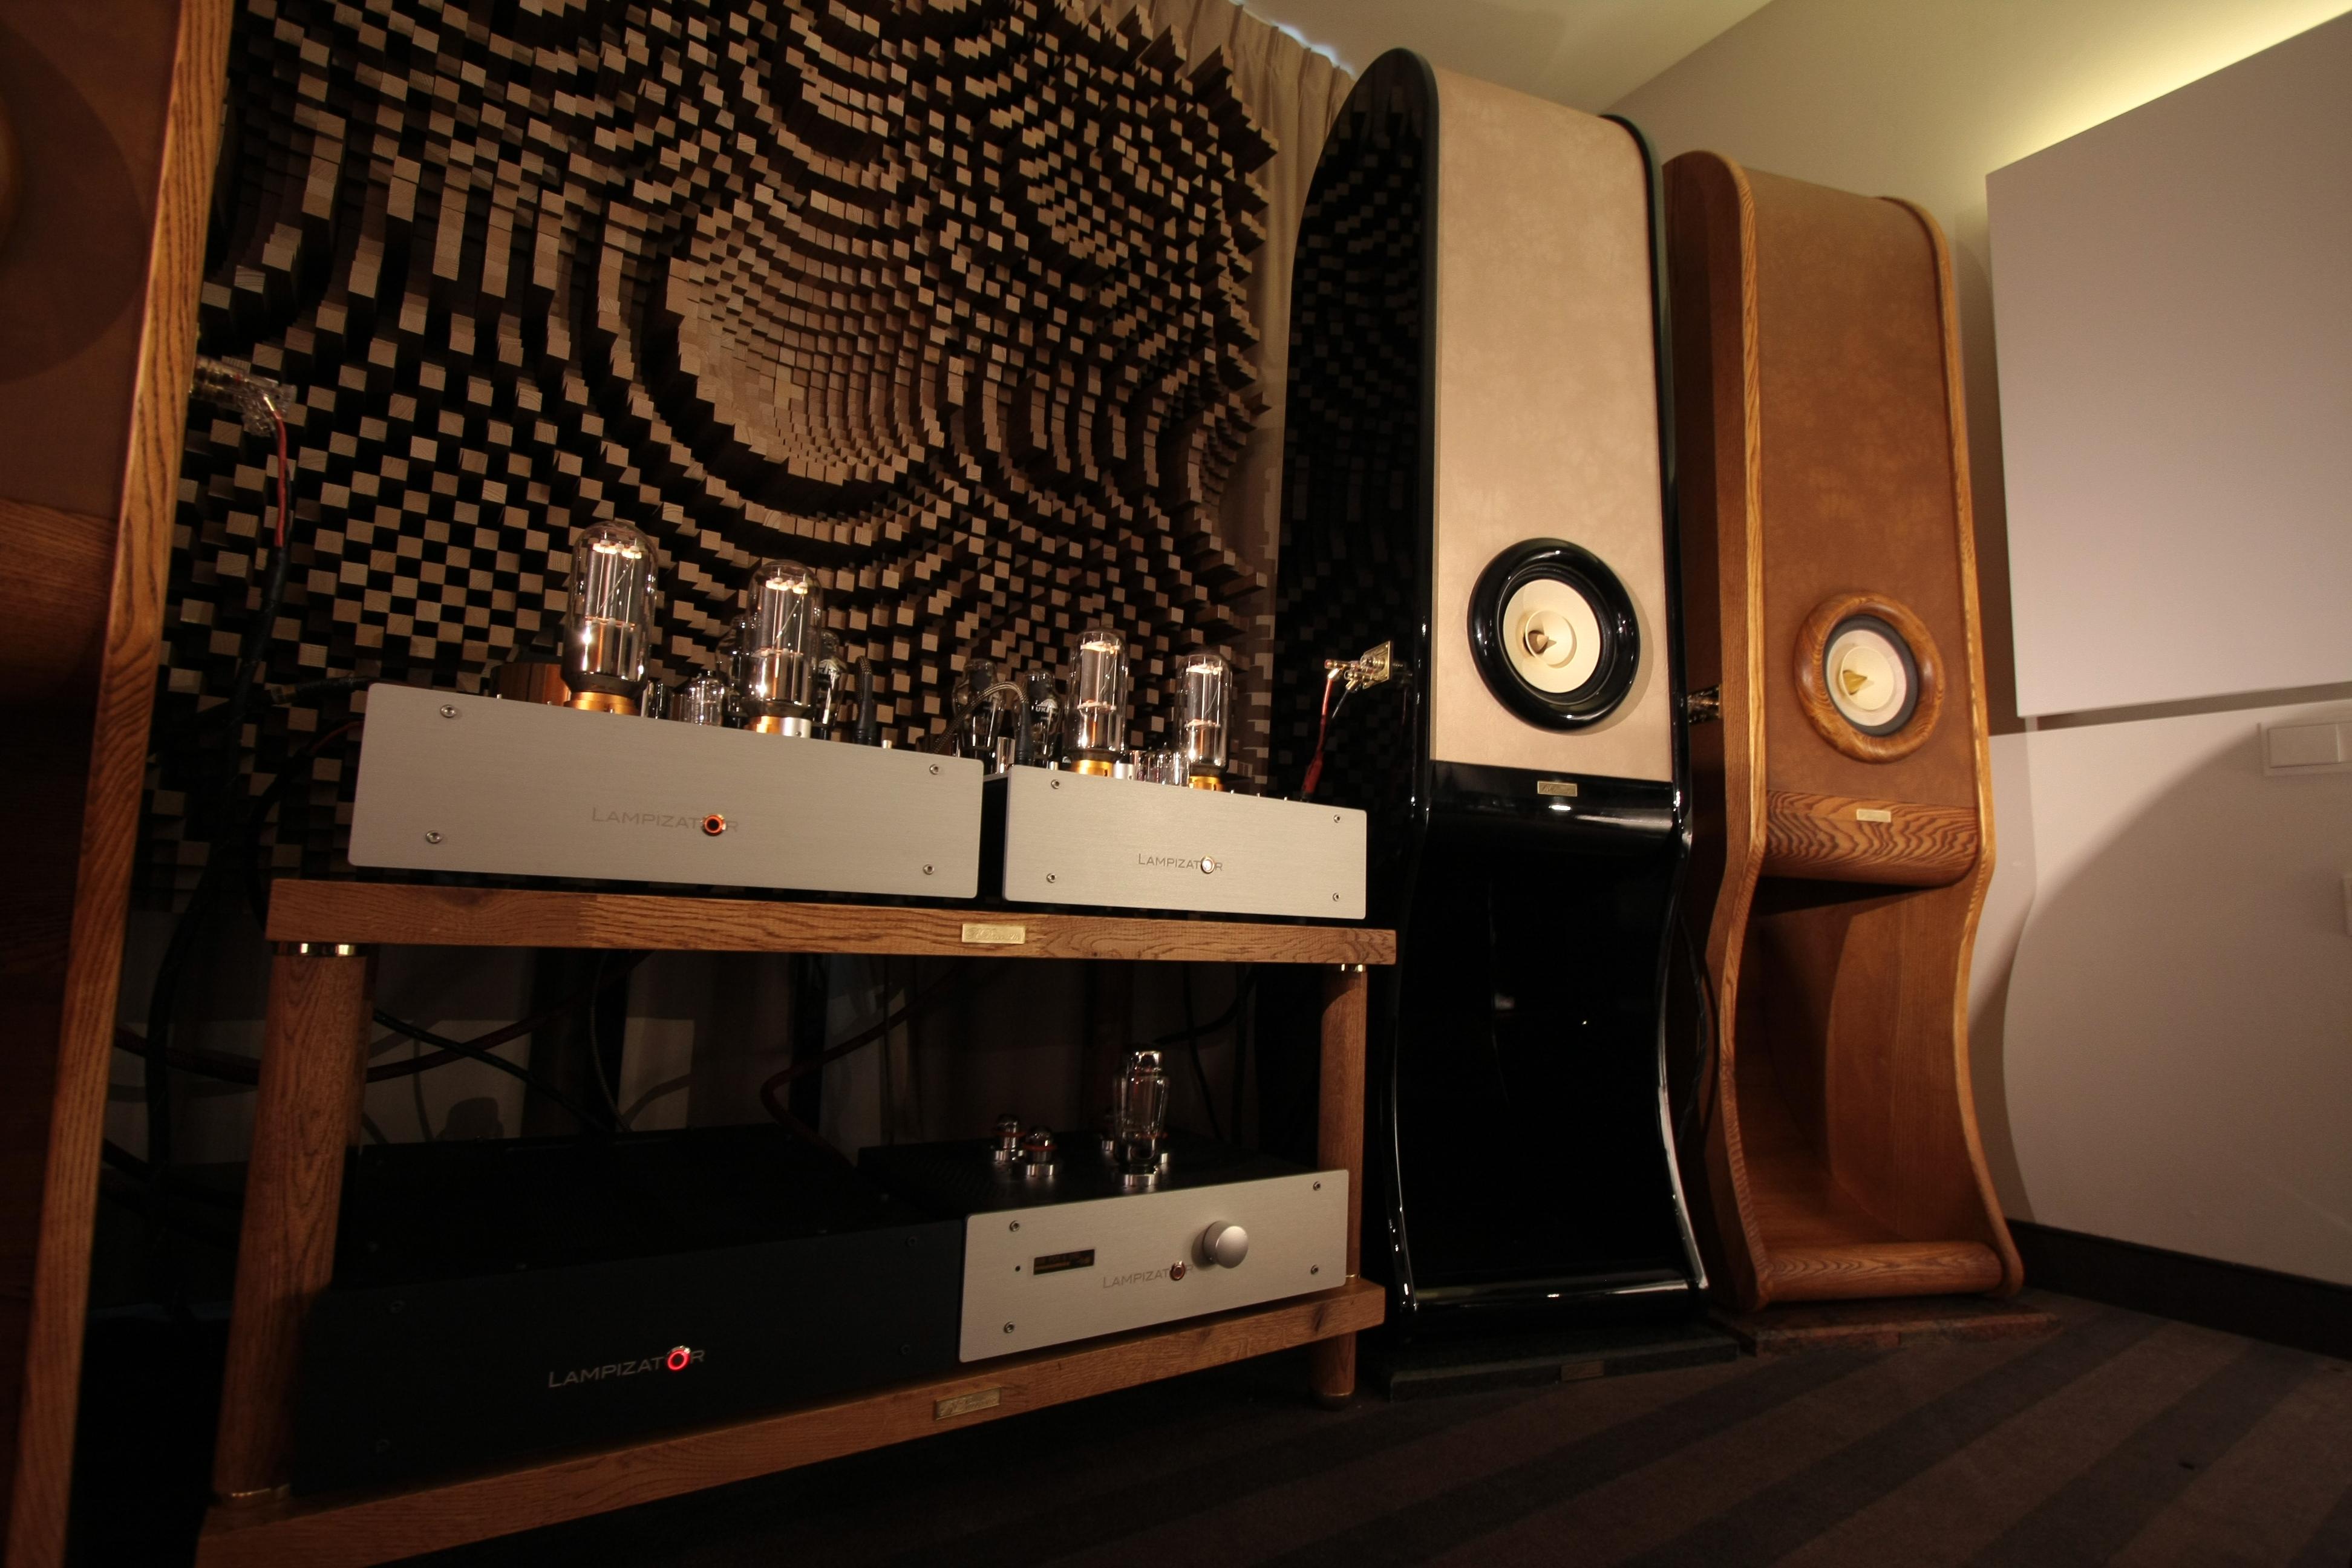 RDacoustic reproduktorové soustavy Evolution stereo 2.0, Lampizator Audio video show Waršava 2016